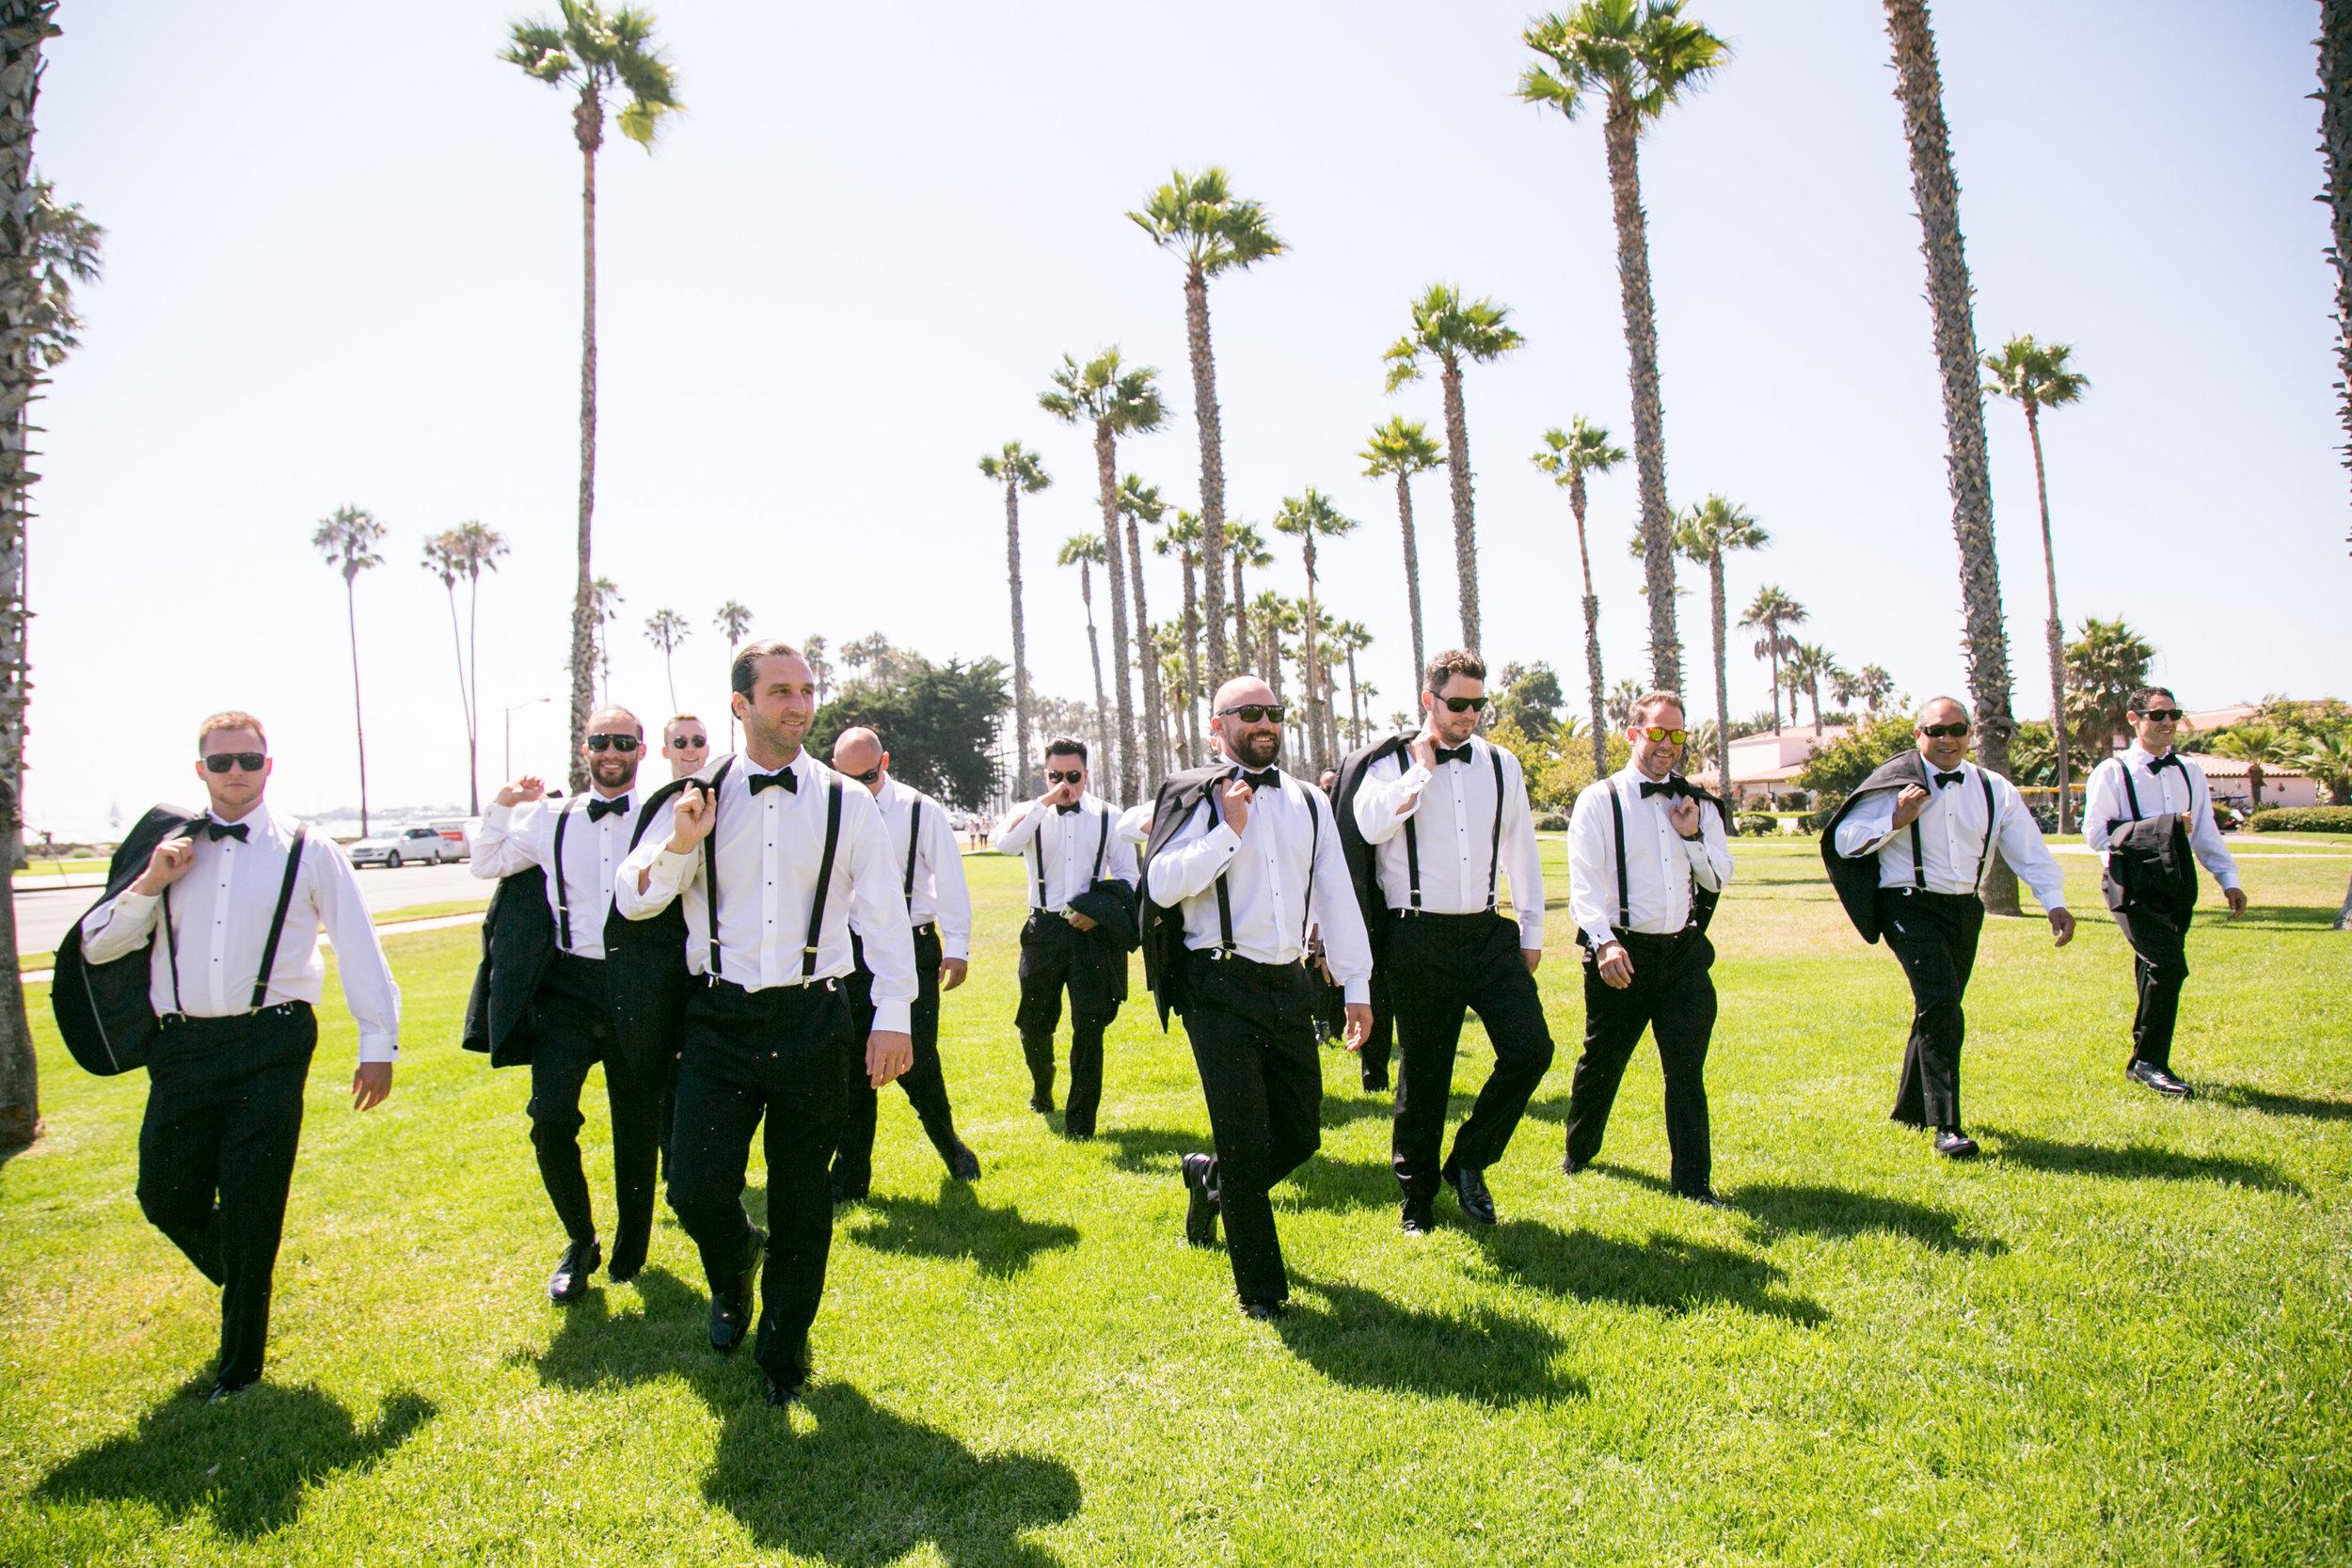 www.santabarbarawedding.com | Chris Schmitt Photography | Felici Events | Fess Parker Double Tree | Groomsmen